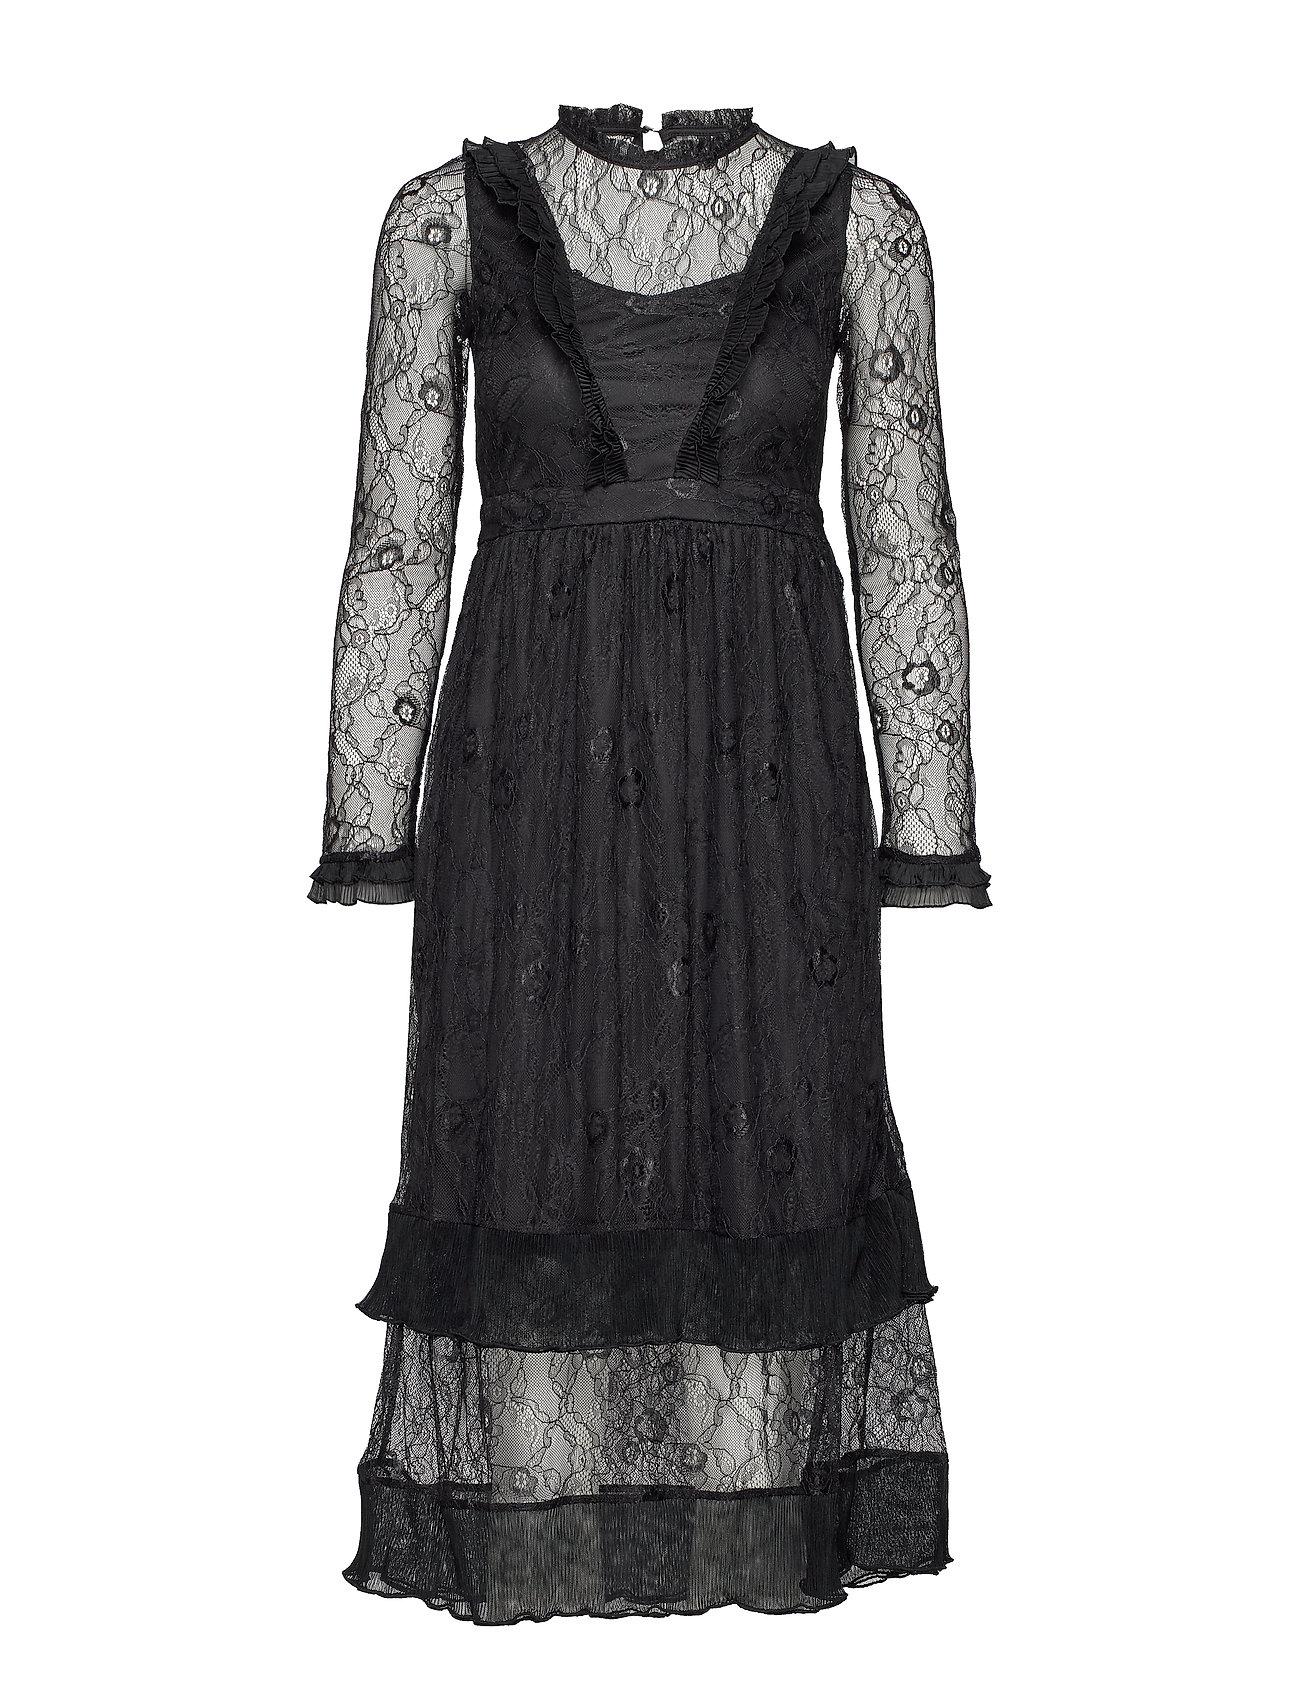 YAS YASCAROLINA LACE DRESS FT - BLACK